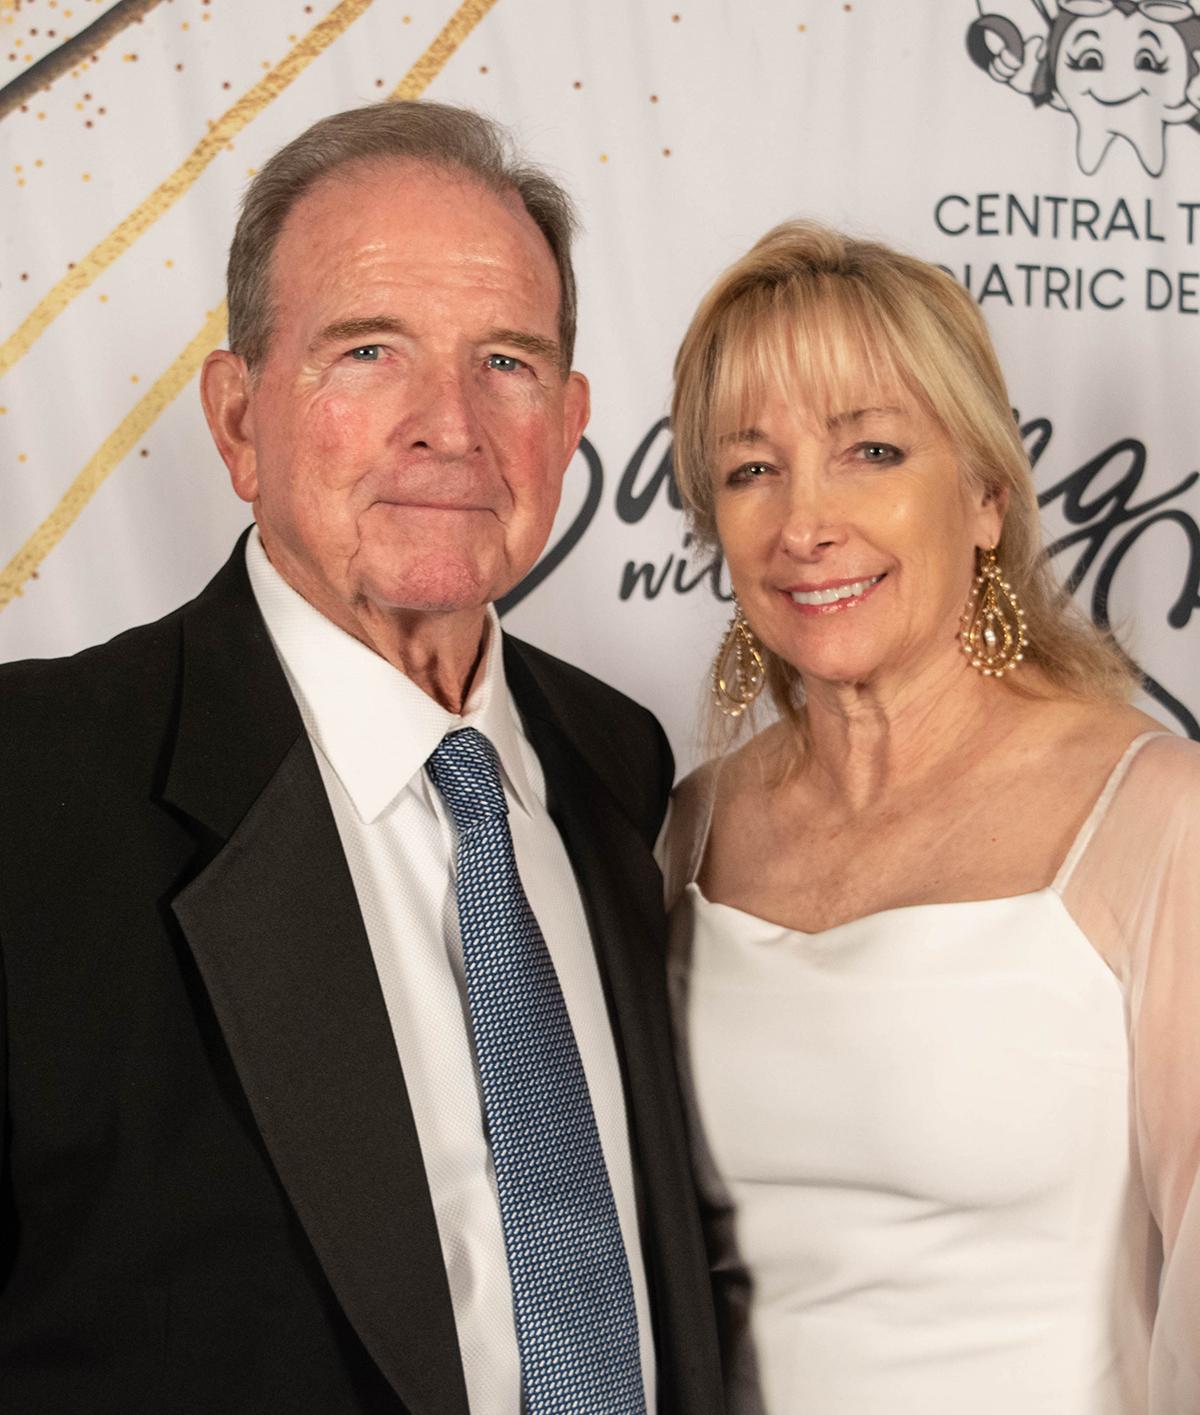 Bill and Katrine Formby